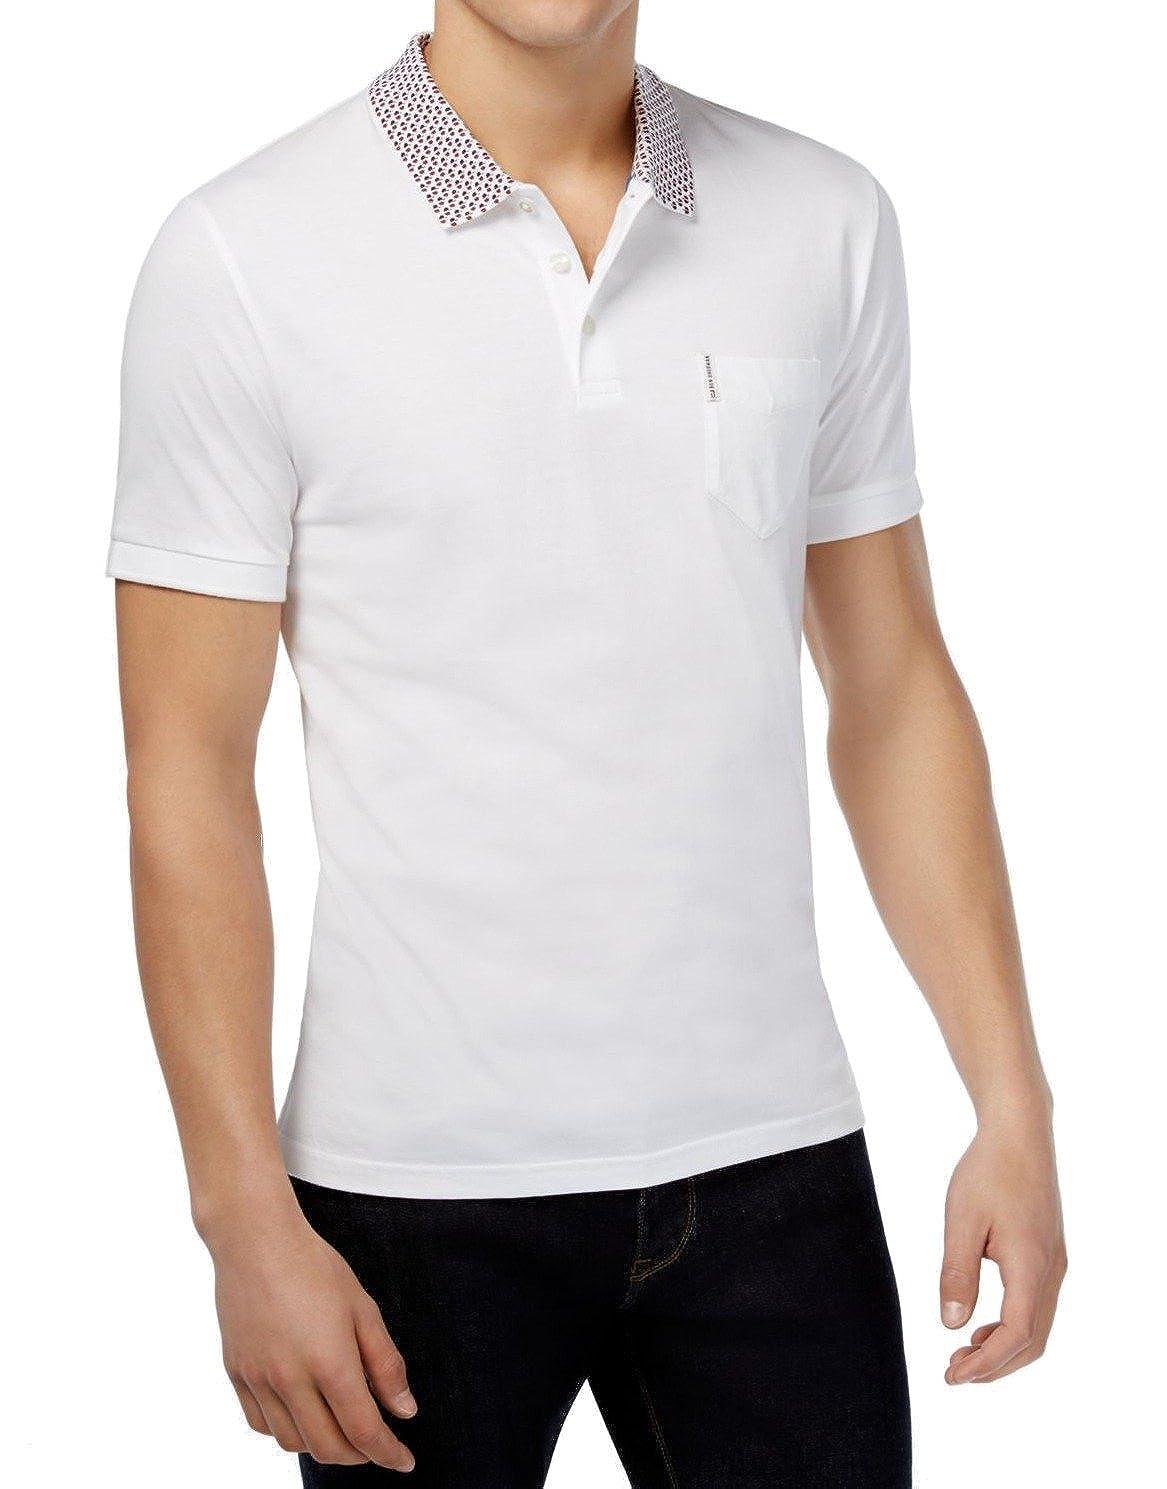 580933e0 Amazon.com: Ben Sherman Men's Romford Polo Shirt: Clothing